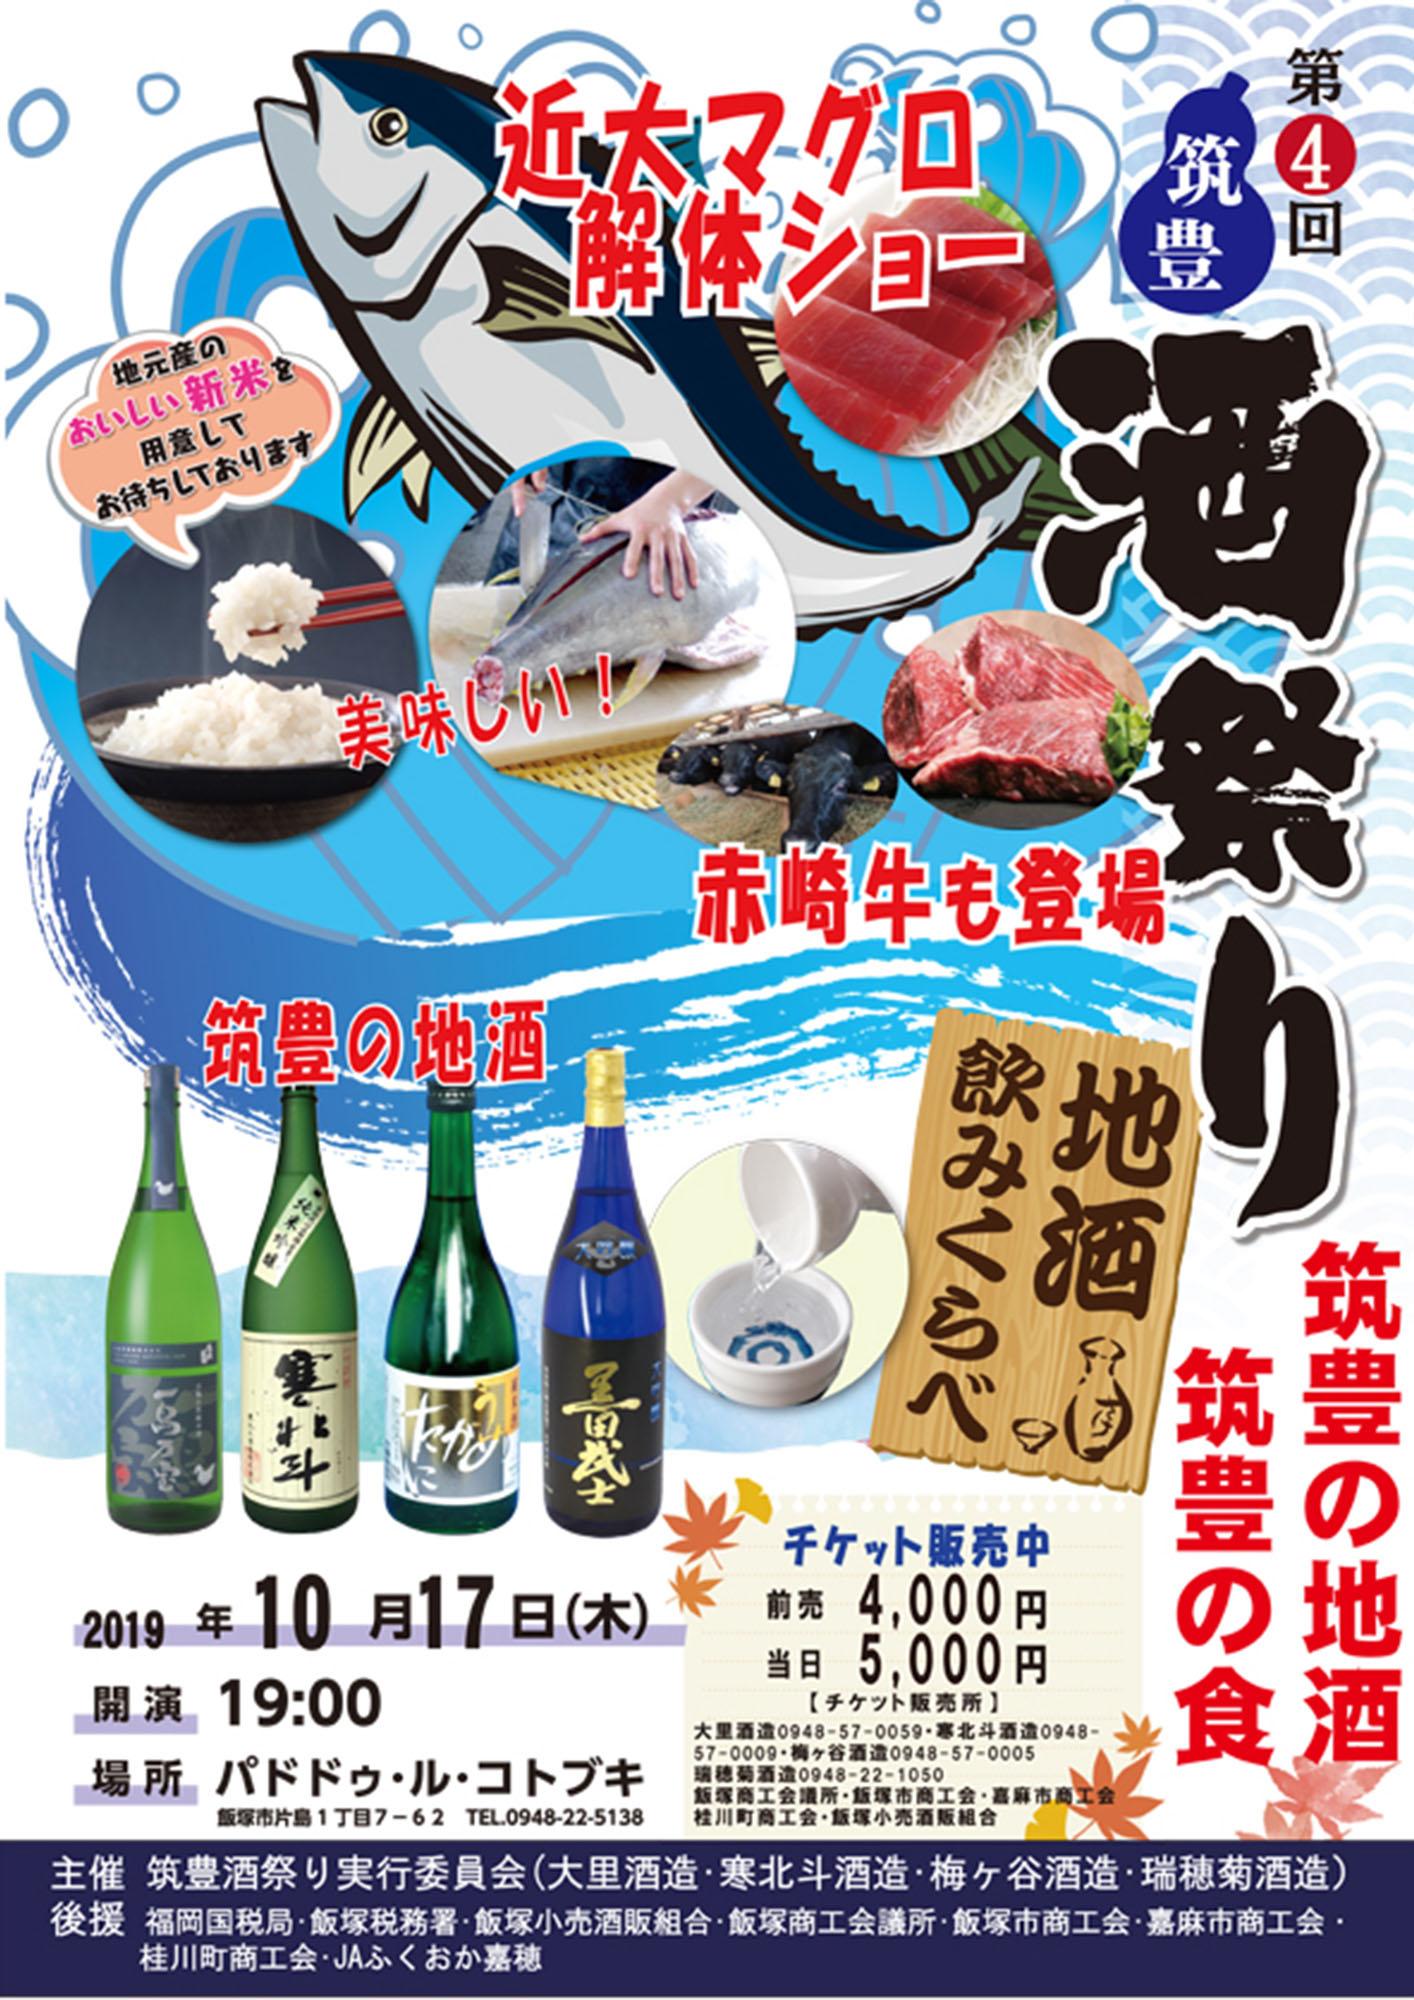 第4回 筑豊酒祭り(2019)